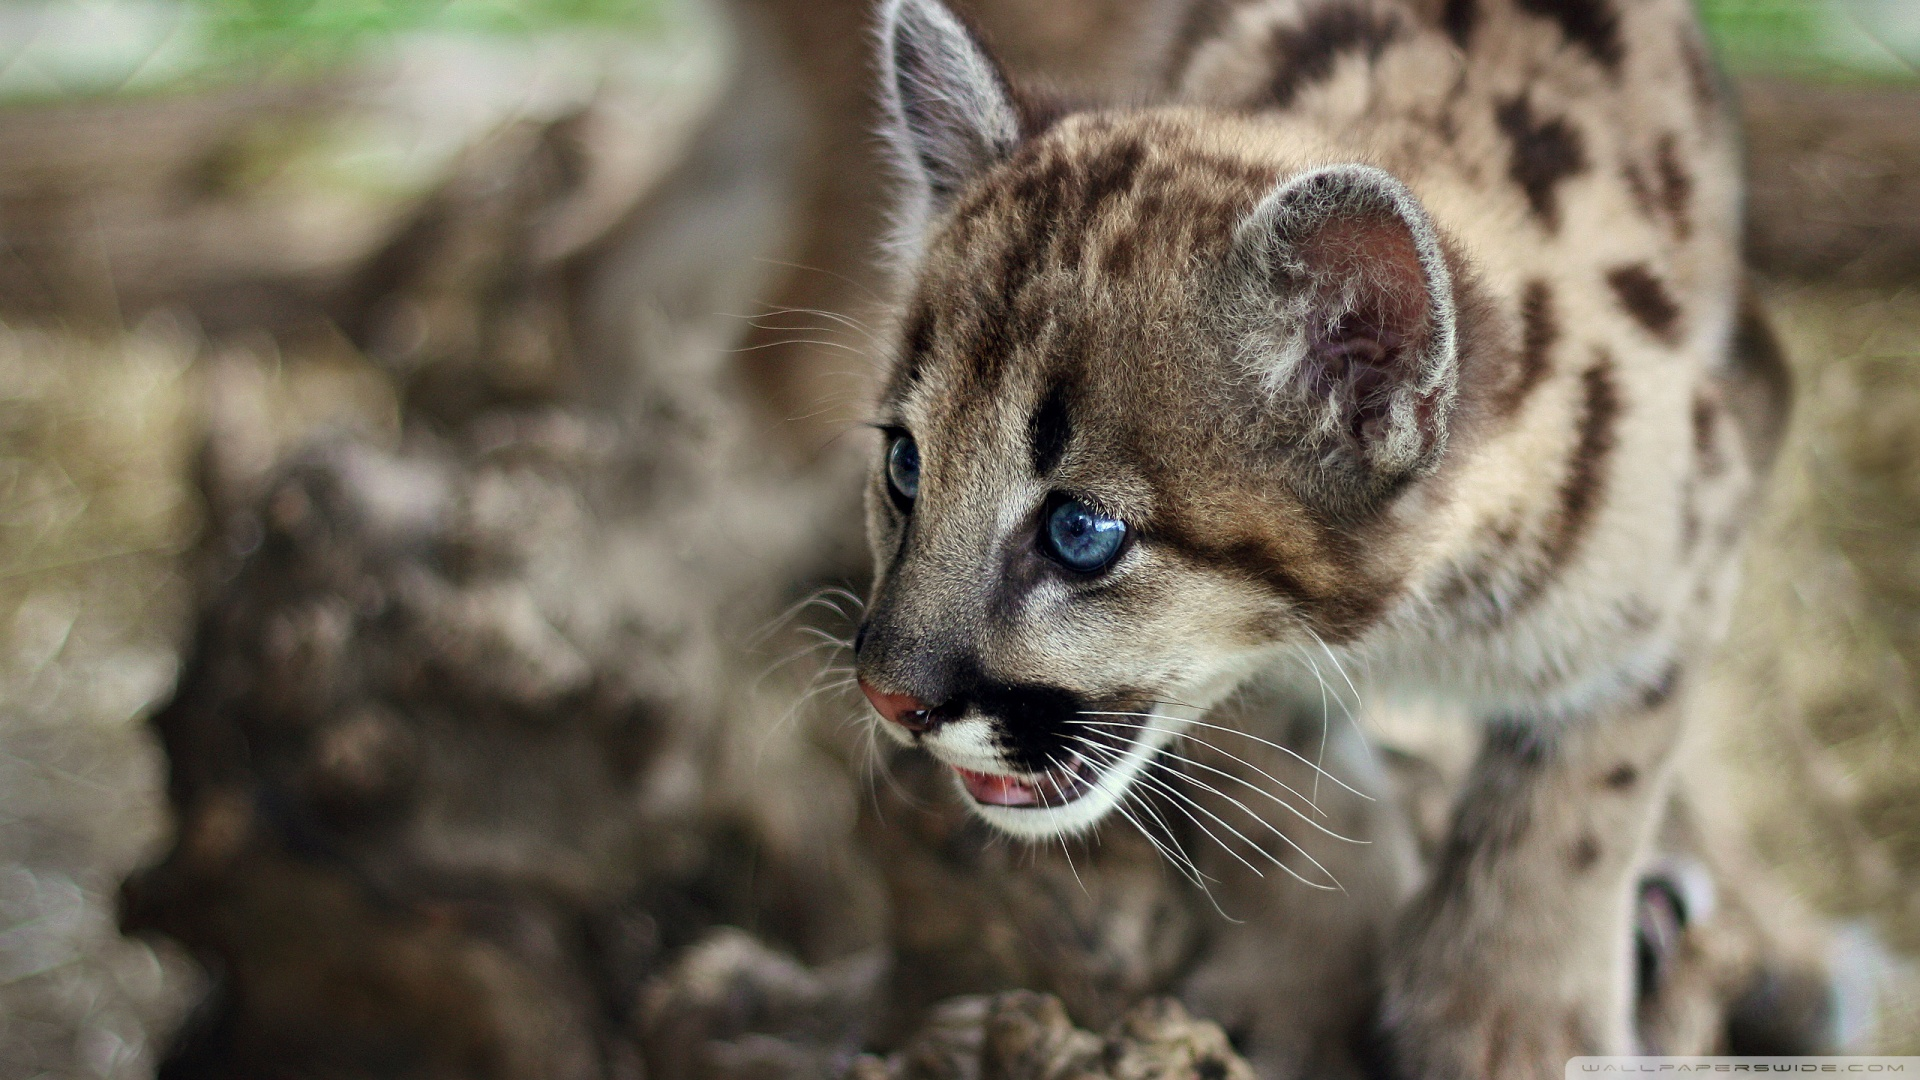 cute cougar wallpaper | 1920x1080 | #12415